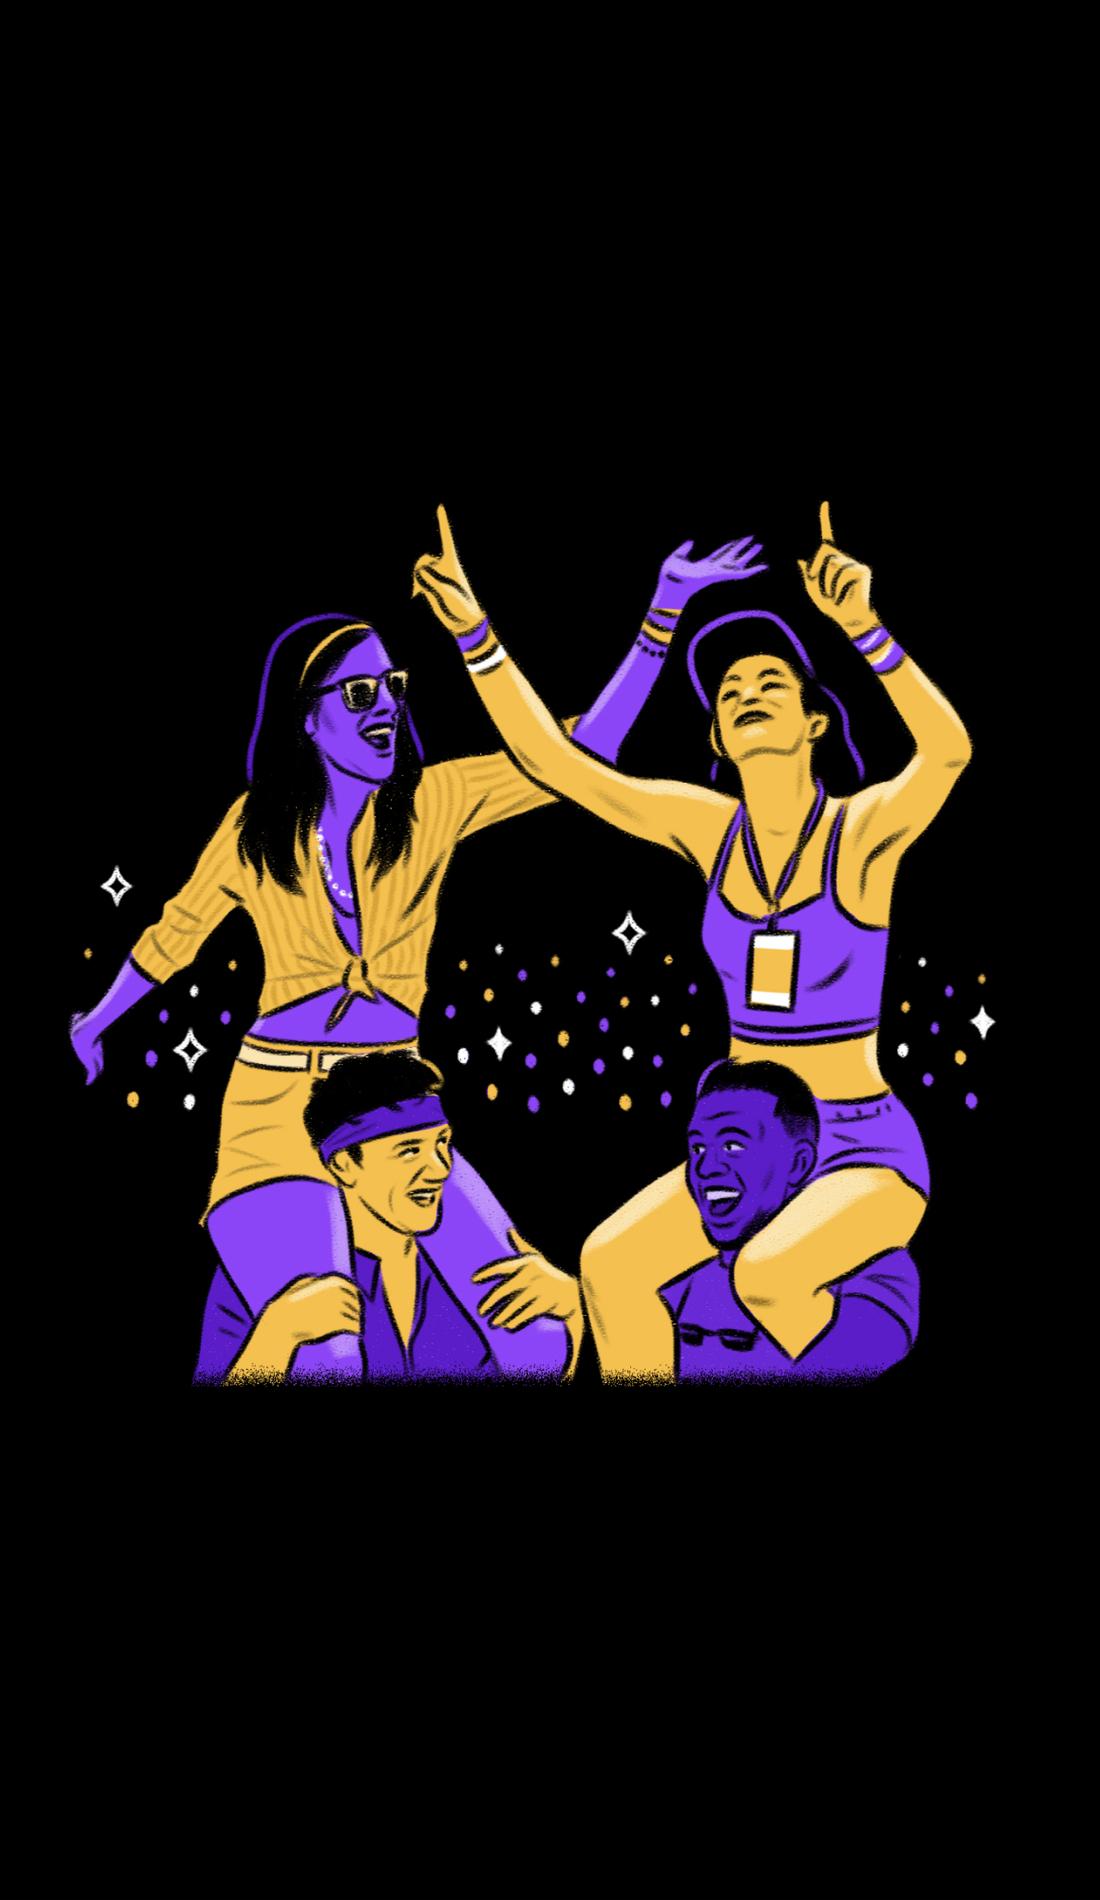 A Vans Warped Tour live event